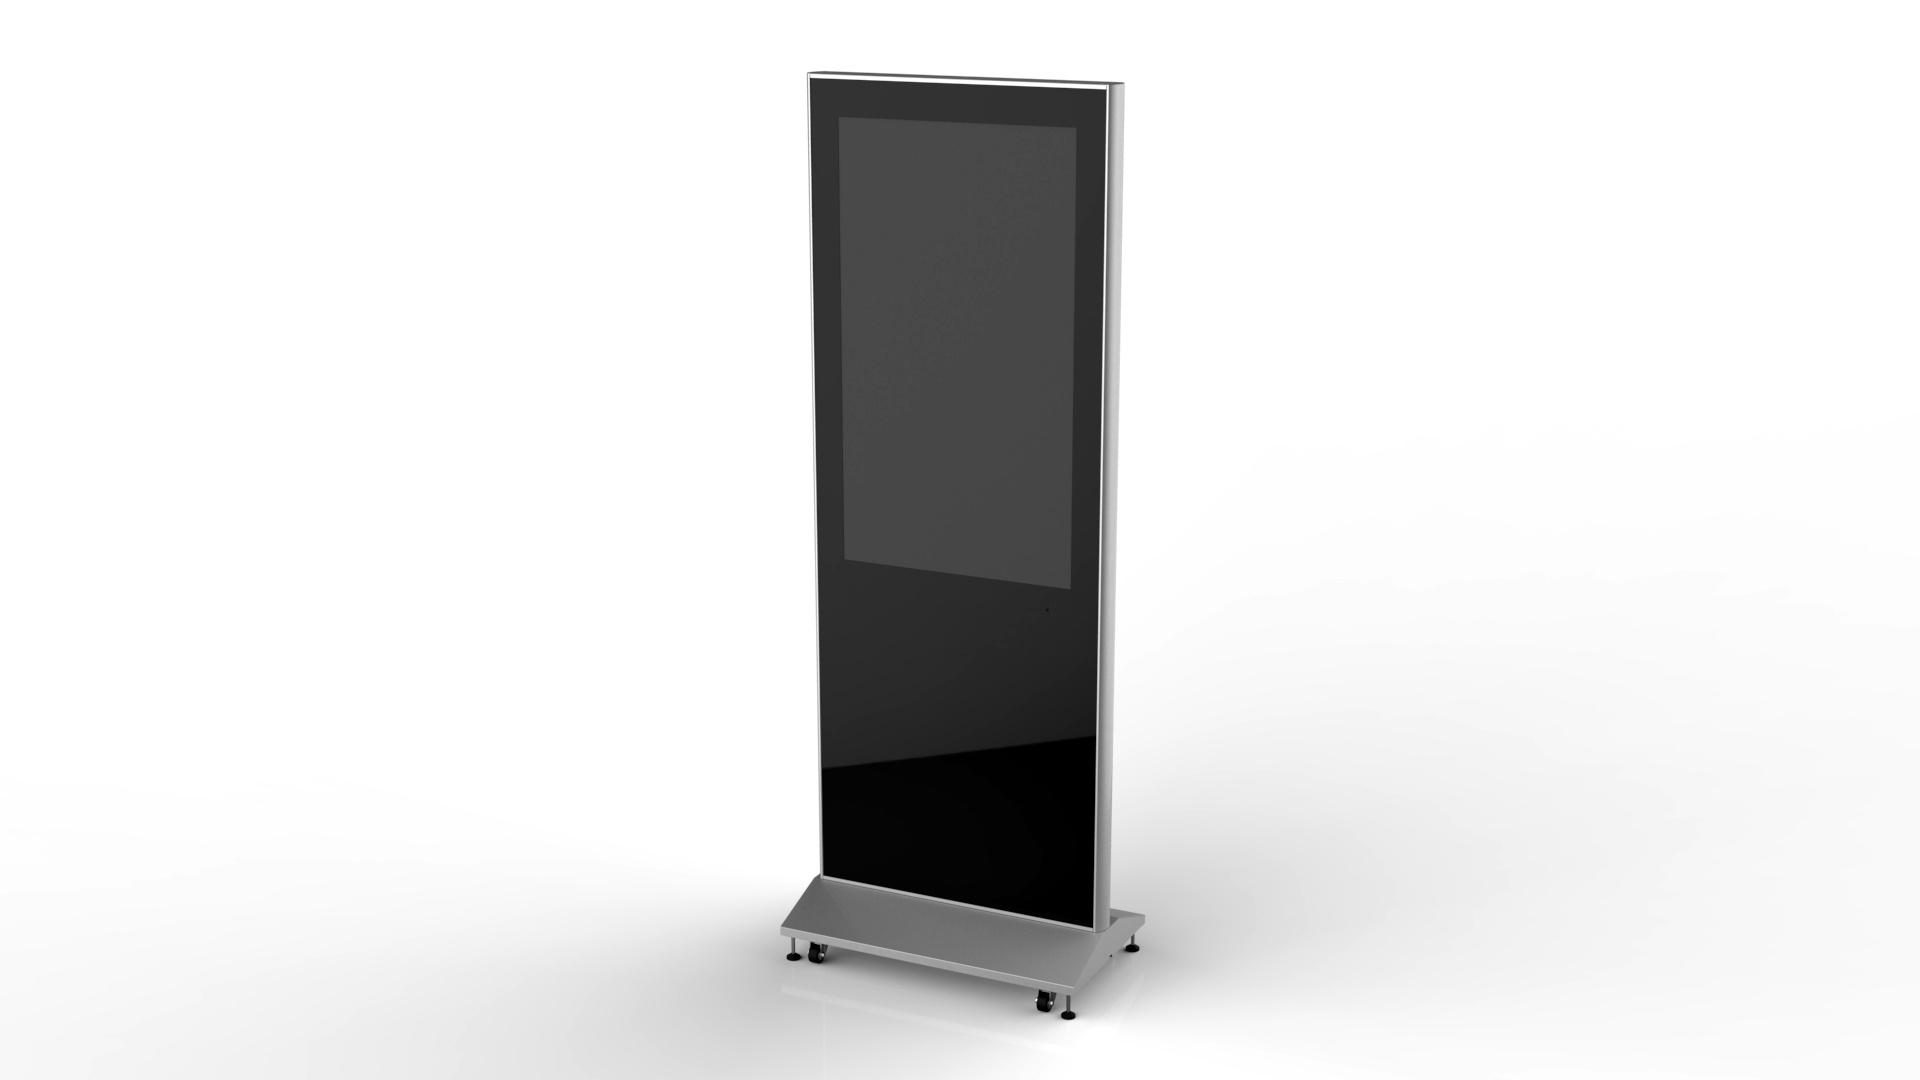 Digital Signage Kiosk-Digital Signage-Large Display Kiosk